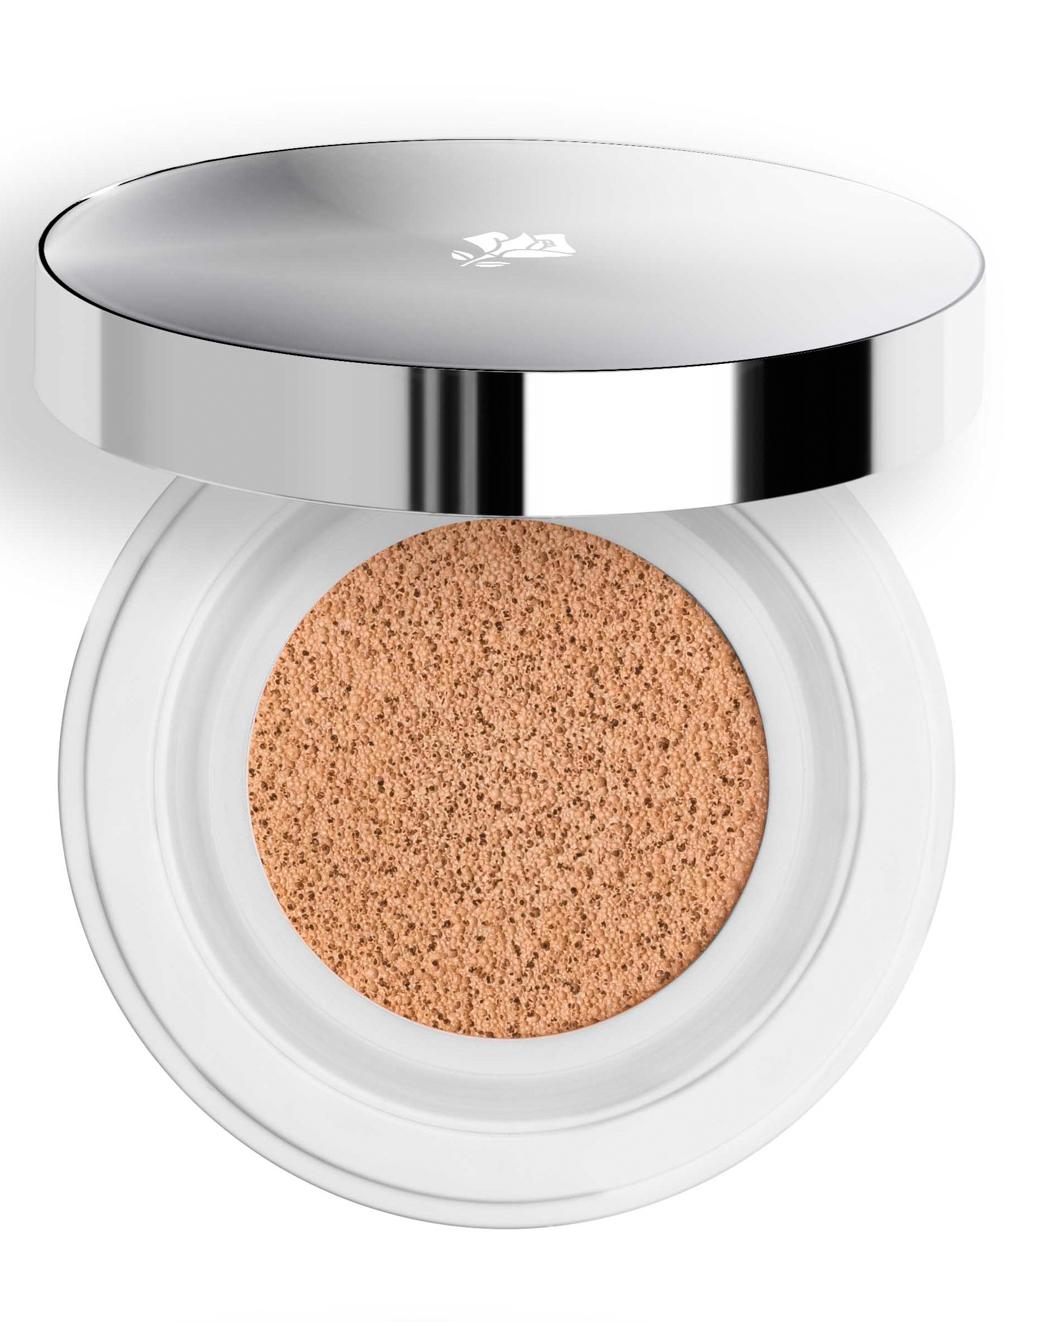 Lancome-Miracle-Cushion-Produktvorstellung-Beautyblogger-Deutschland-Lindarella-3